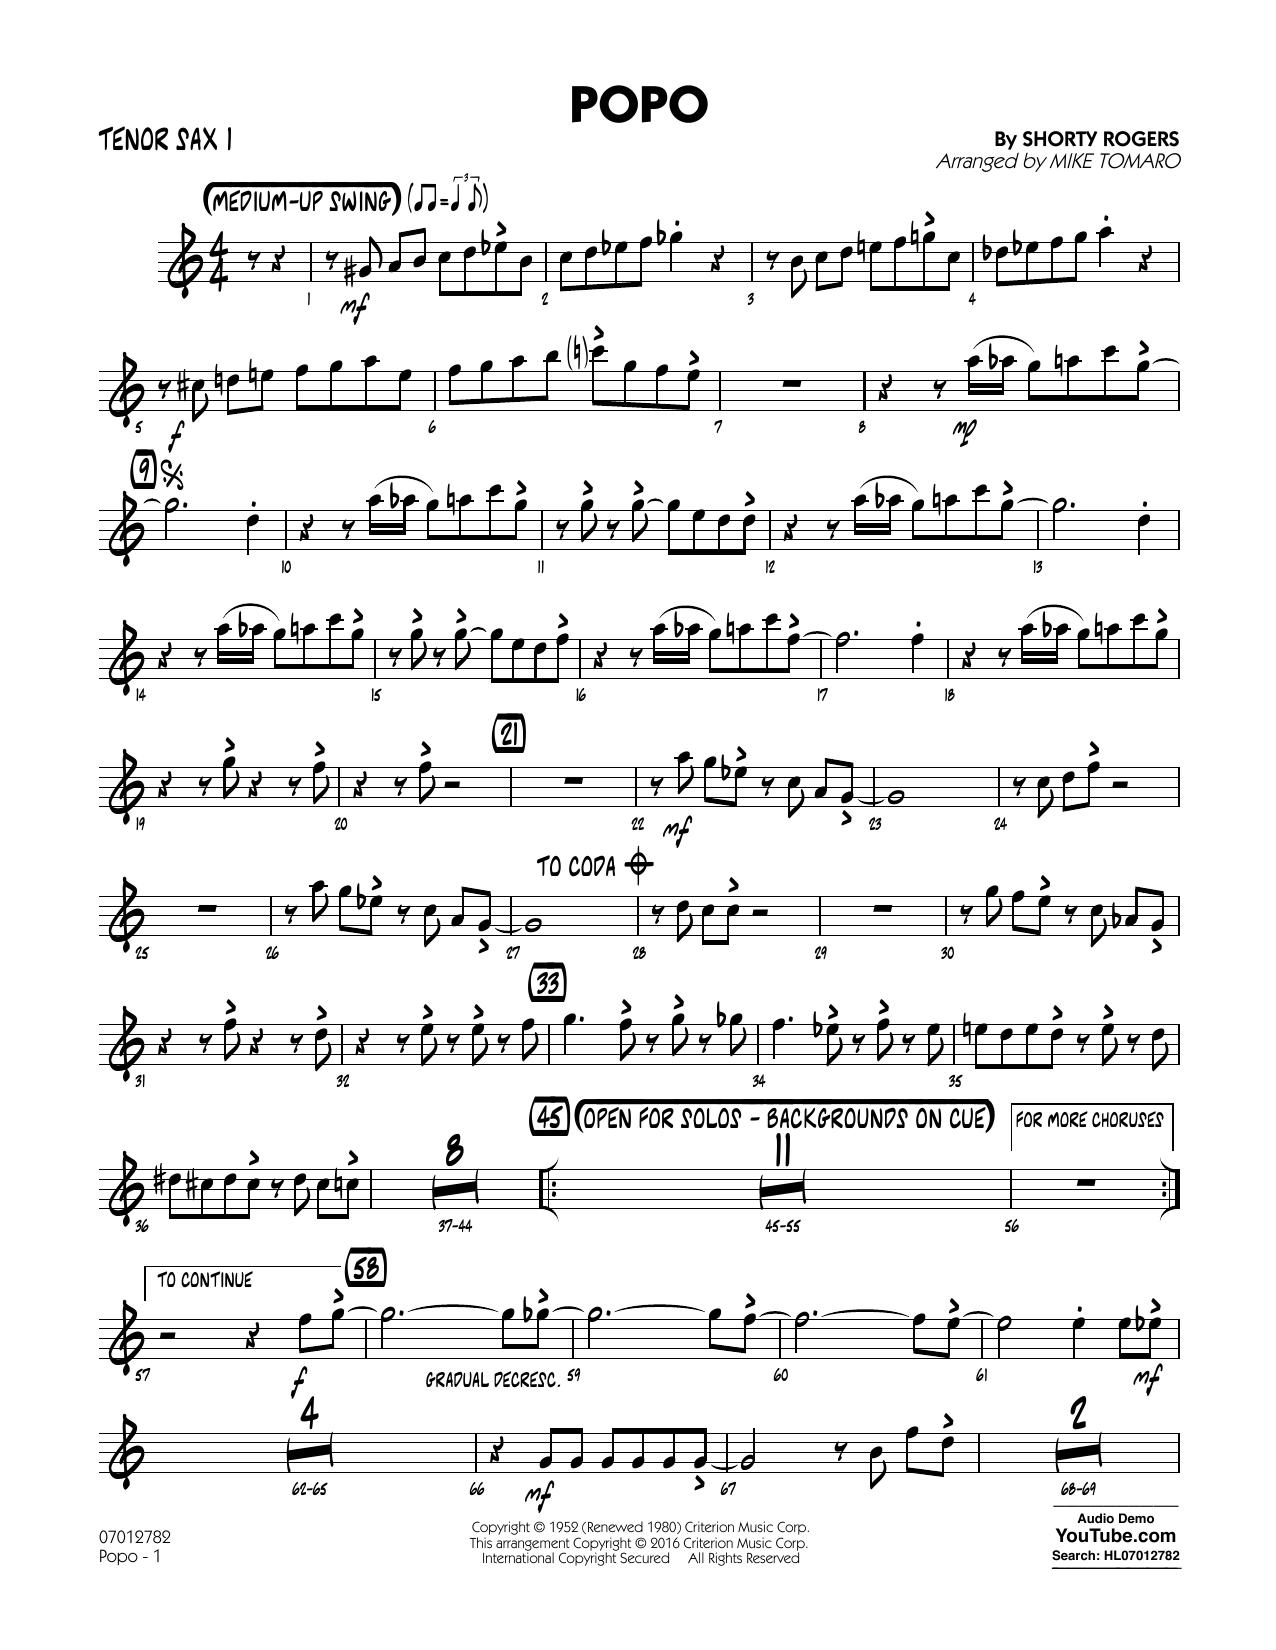 Popo - Tenor Sax 1